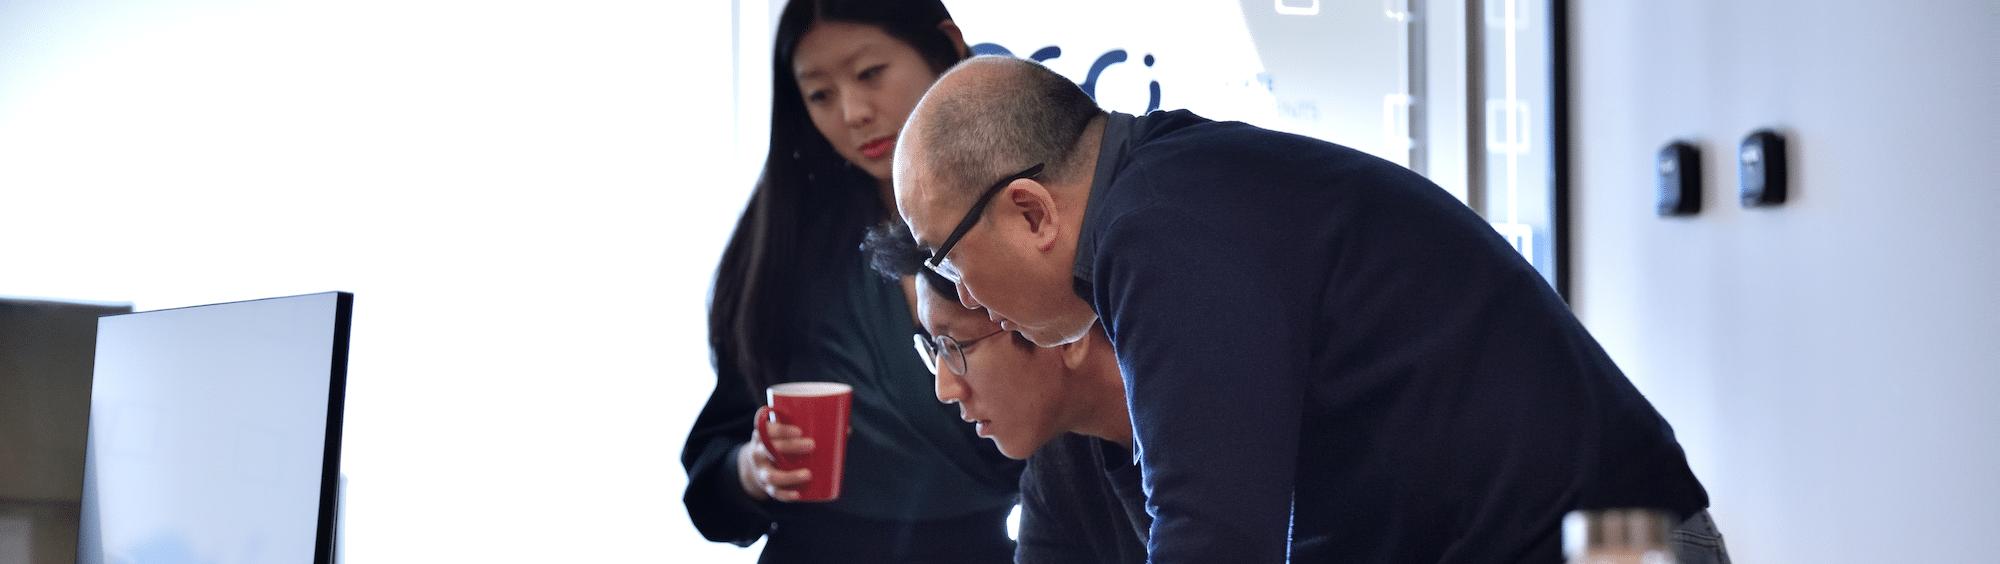 intrapreneurship innovation culture